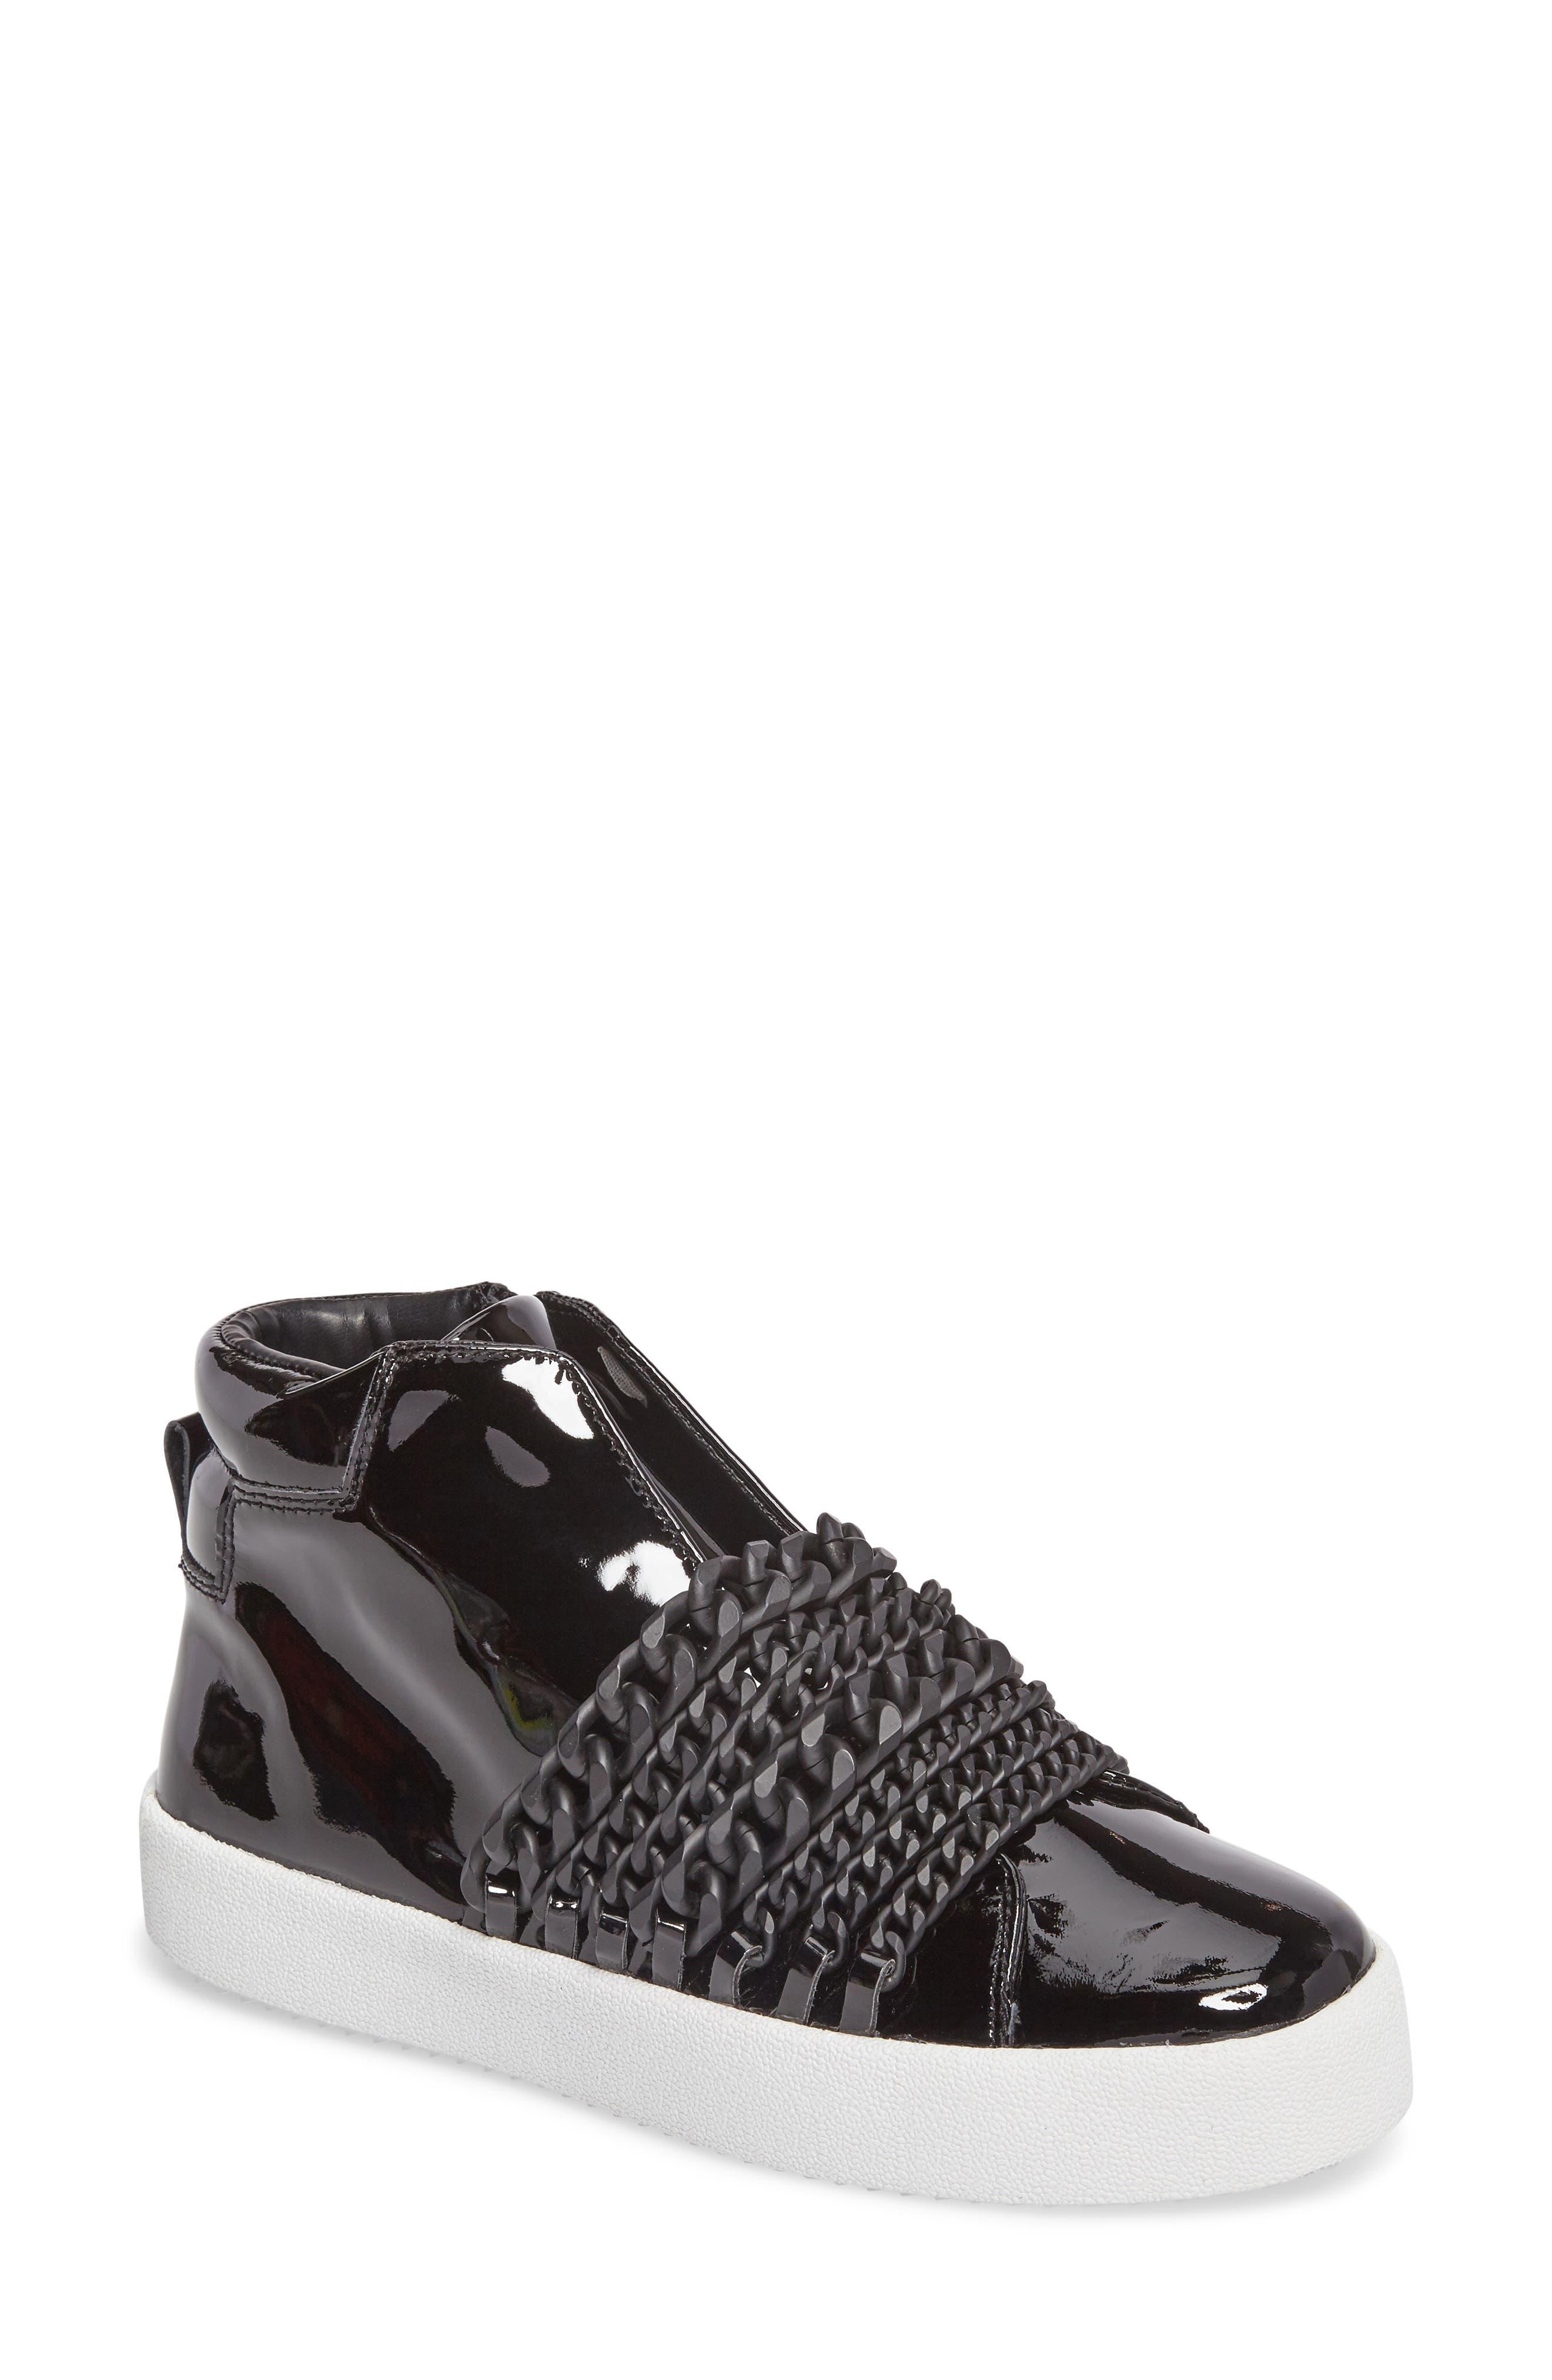 KENDALL + KYLIE Duke Chain High Top Sneaker (Women)